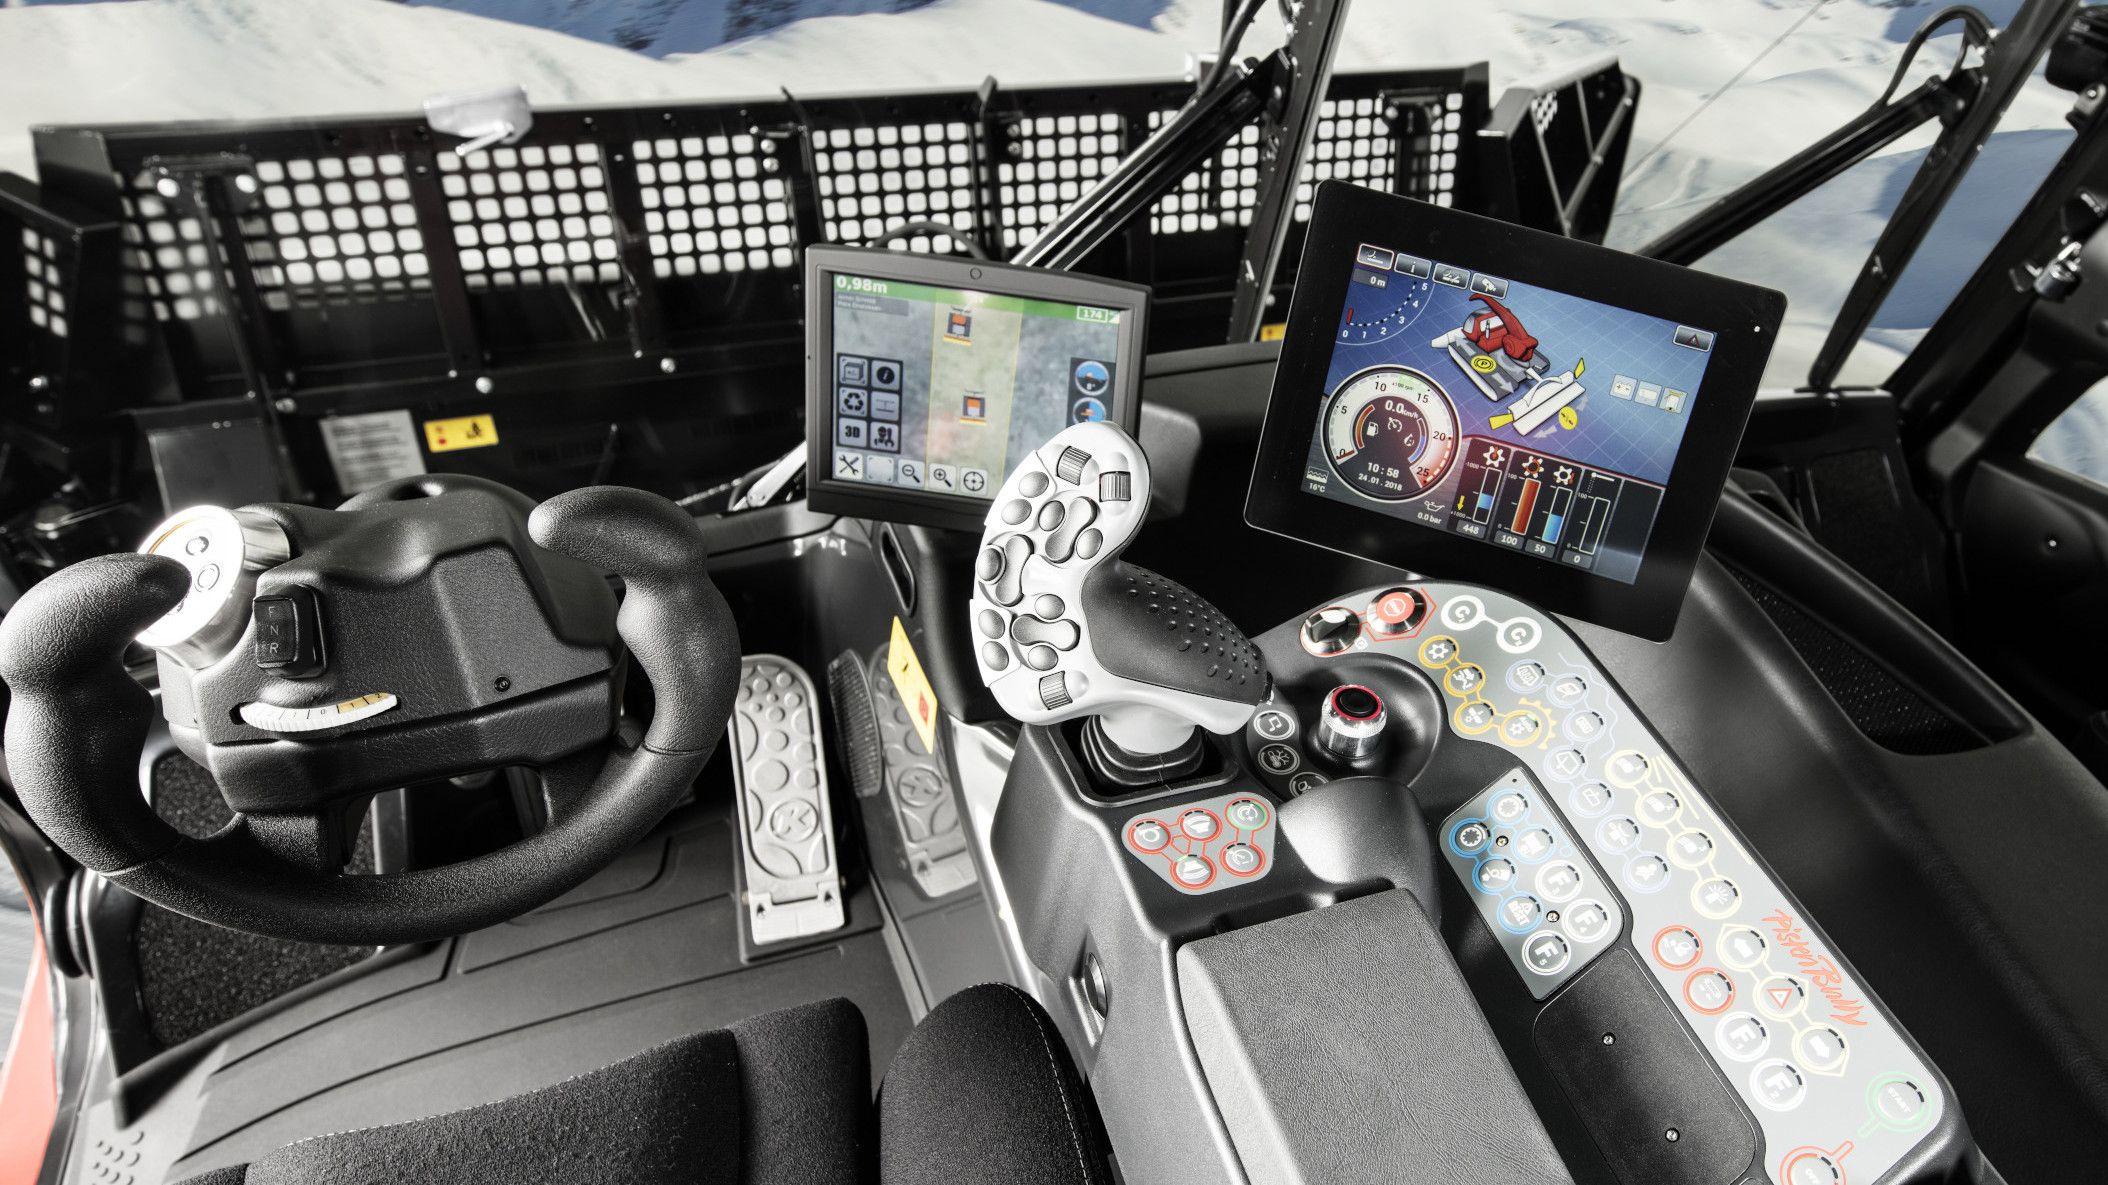 Das innovative Cockpit des PistenBully 600 Polar.